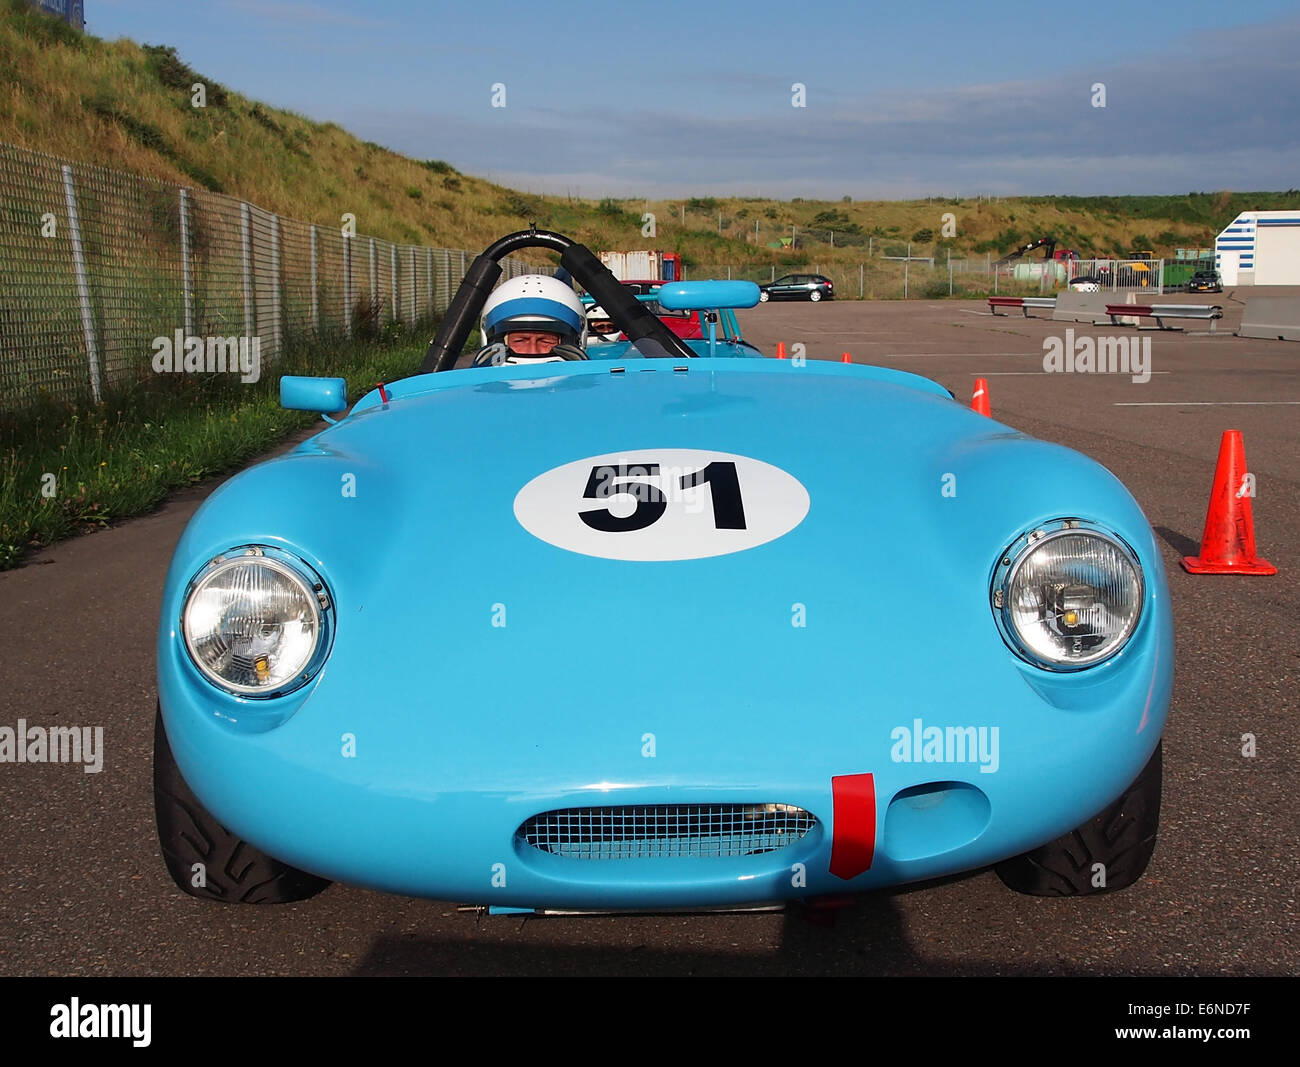 Austin Healey Sprite Monza - No52, Pieter Bakker in Zandvoort, pic1 Stockbild